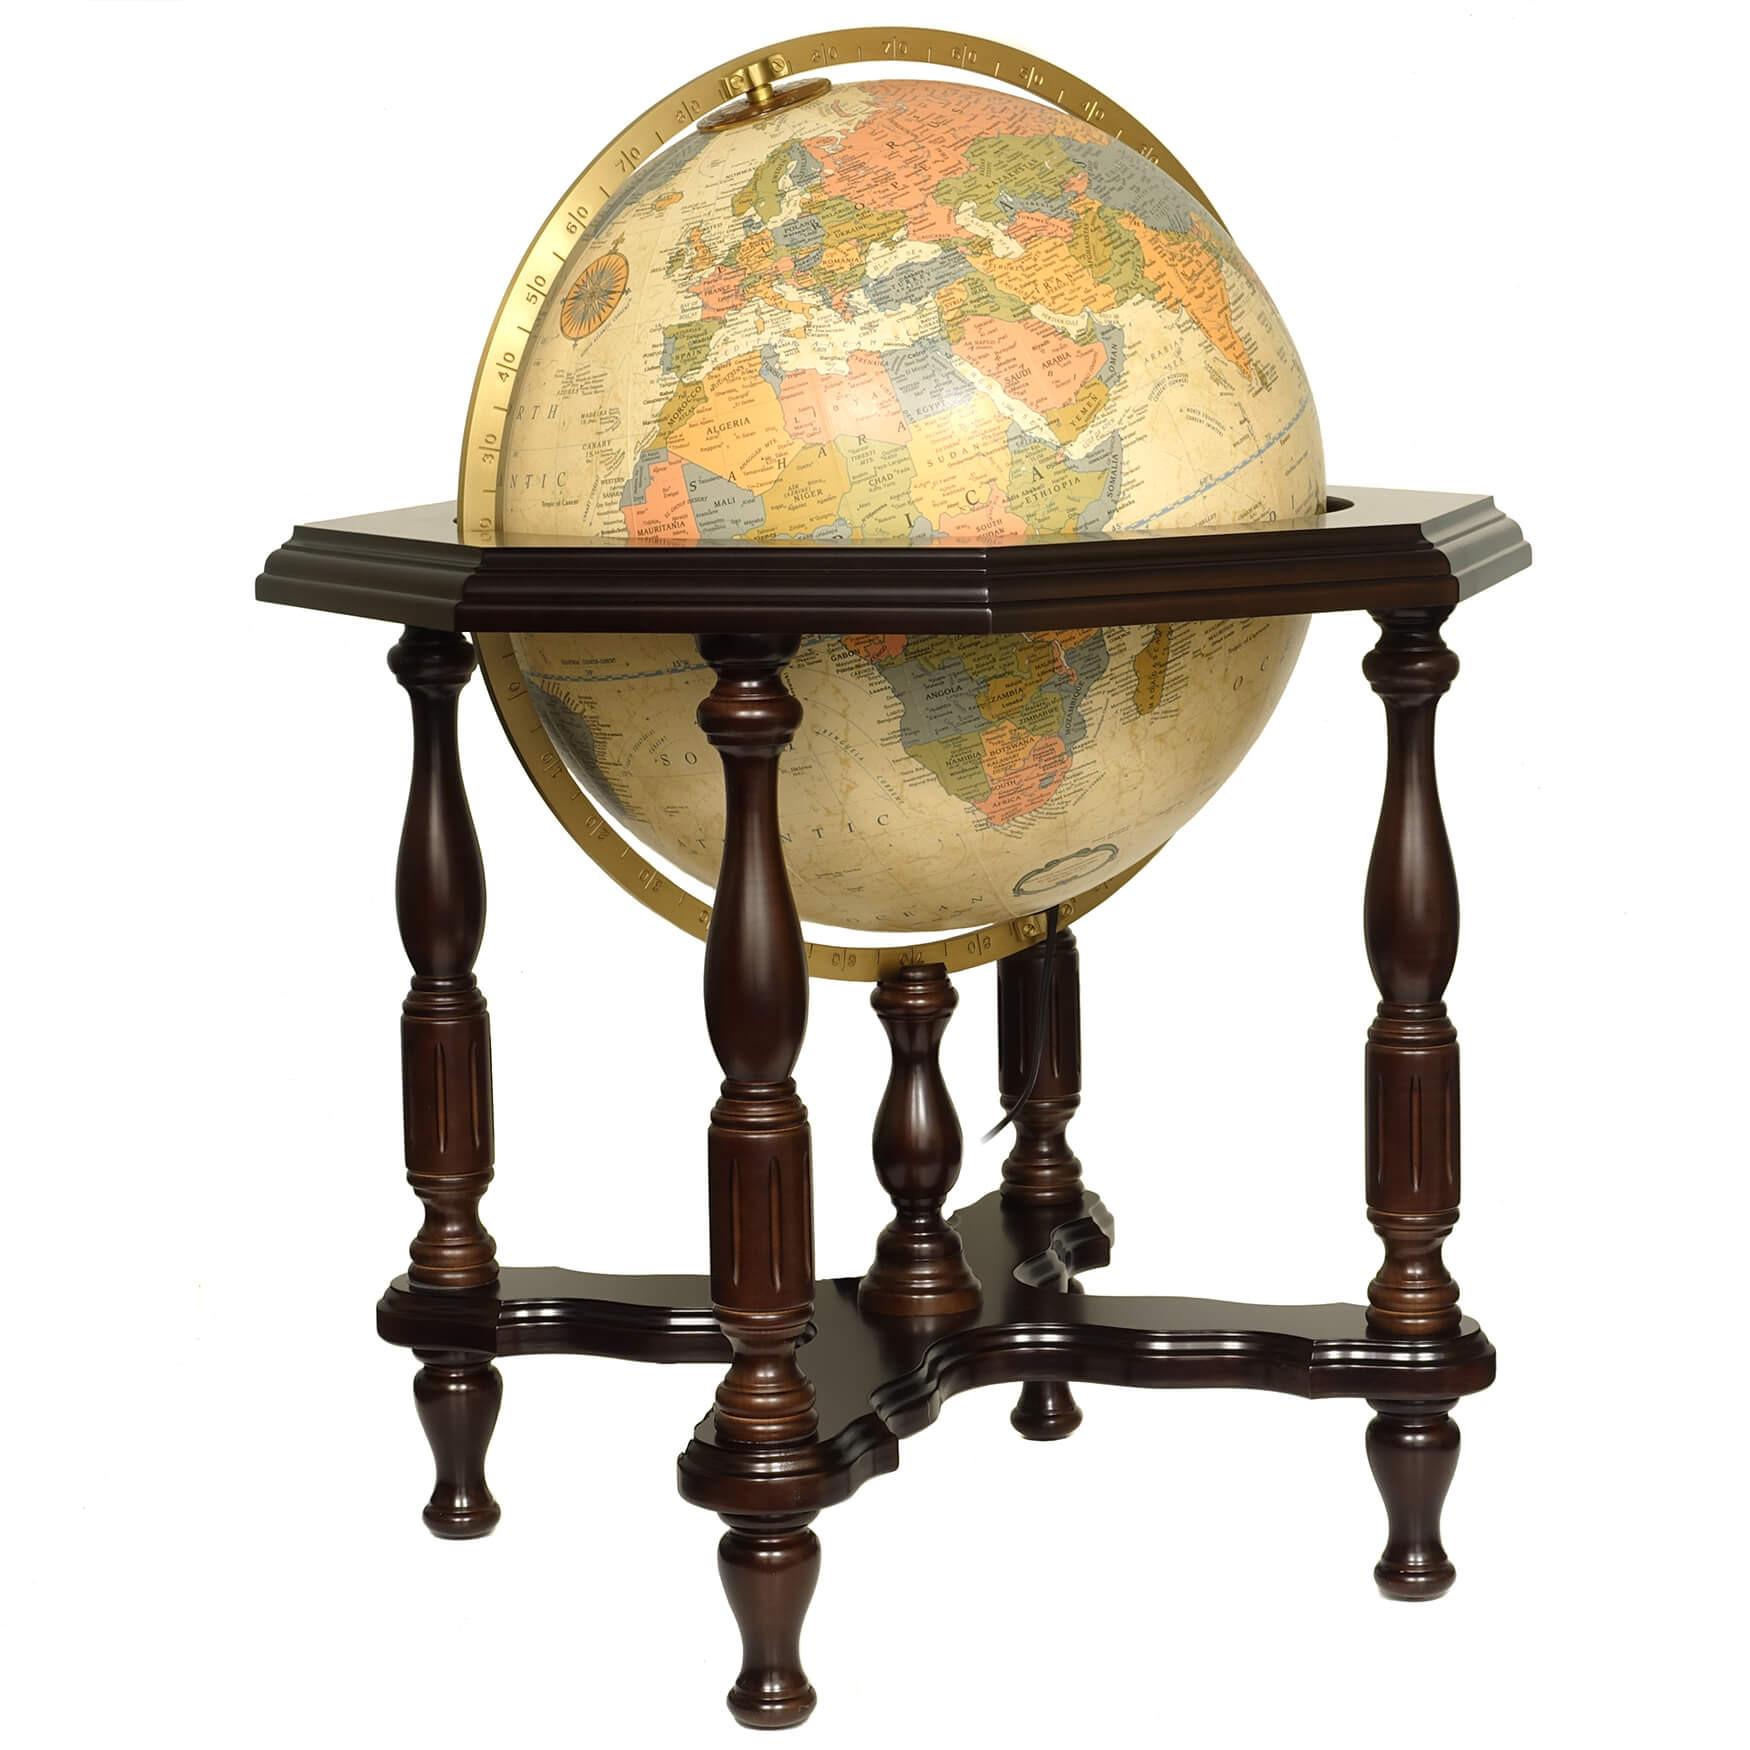 Statesman Antique Illuminated Globe